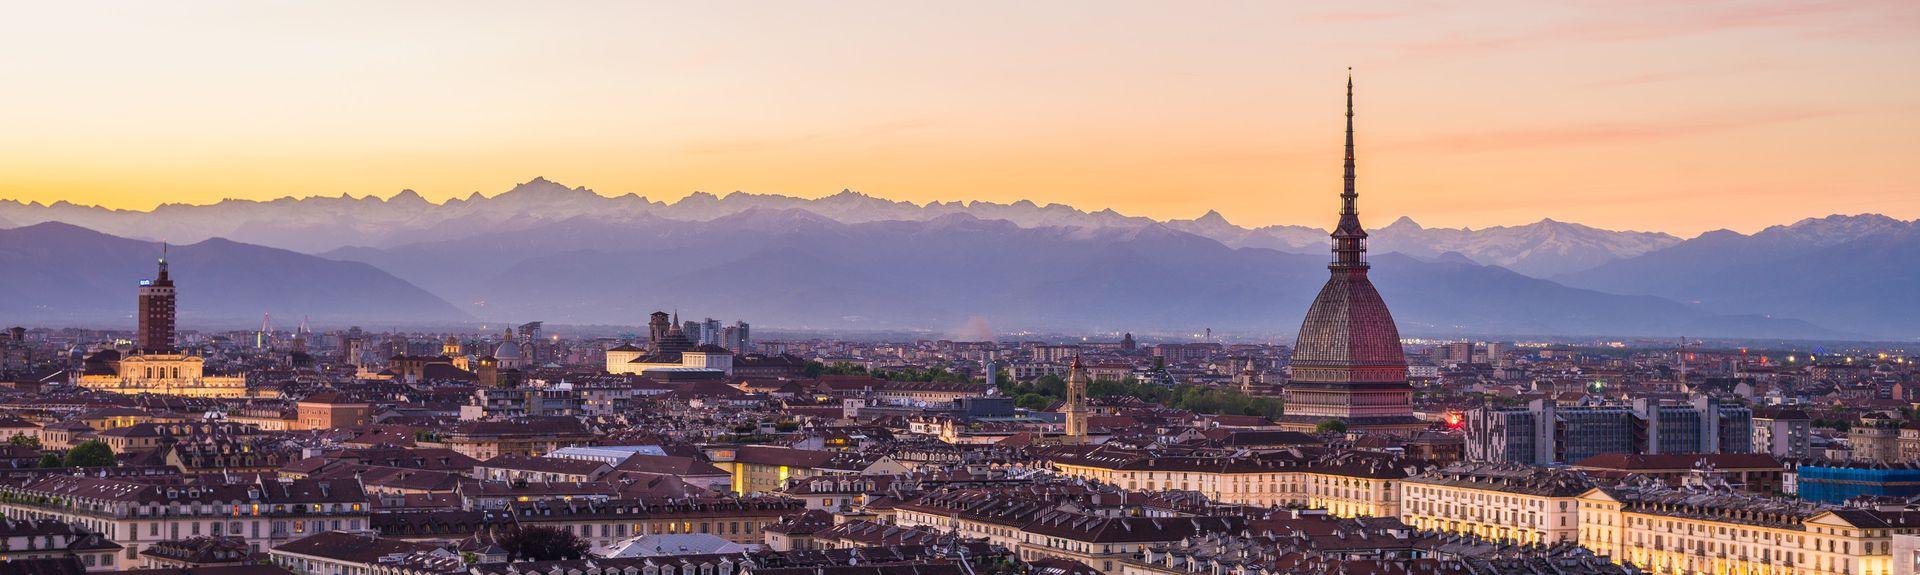 Turin, Piémont, Italie